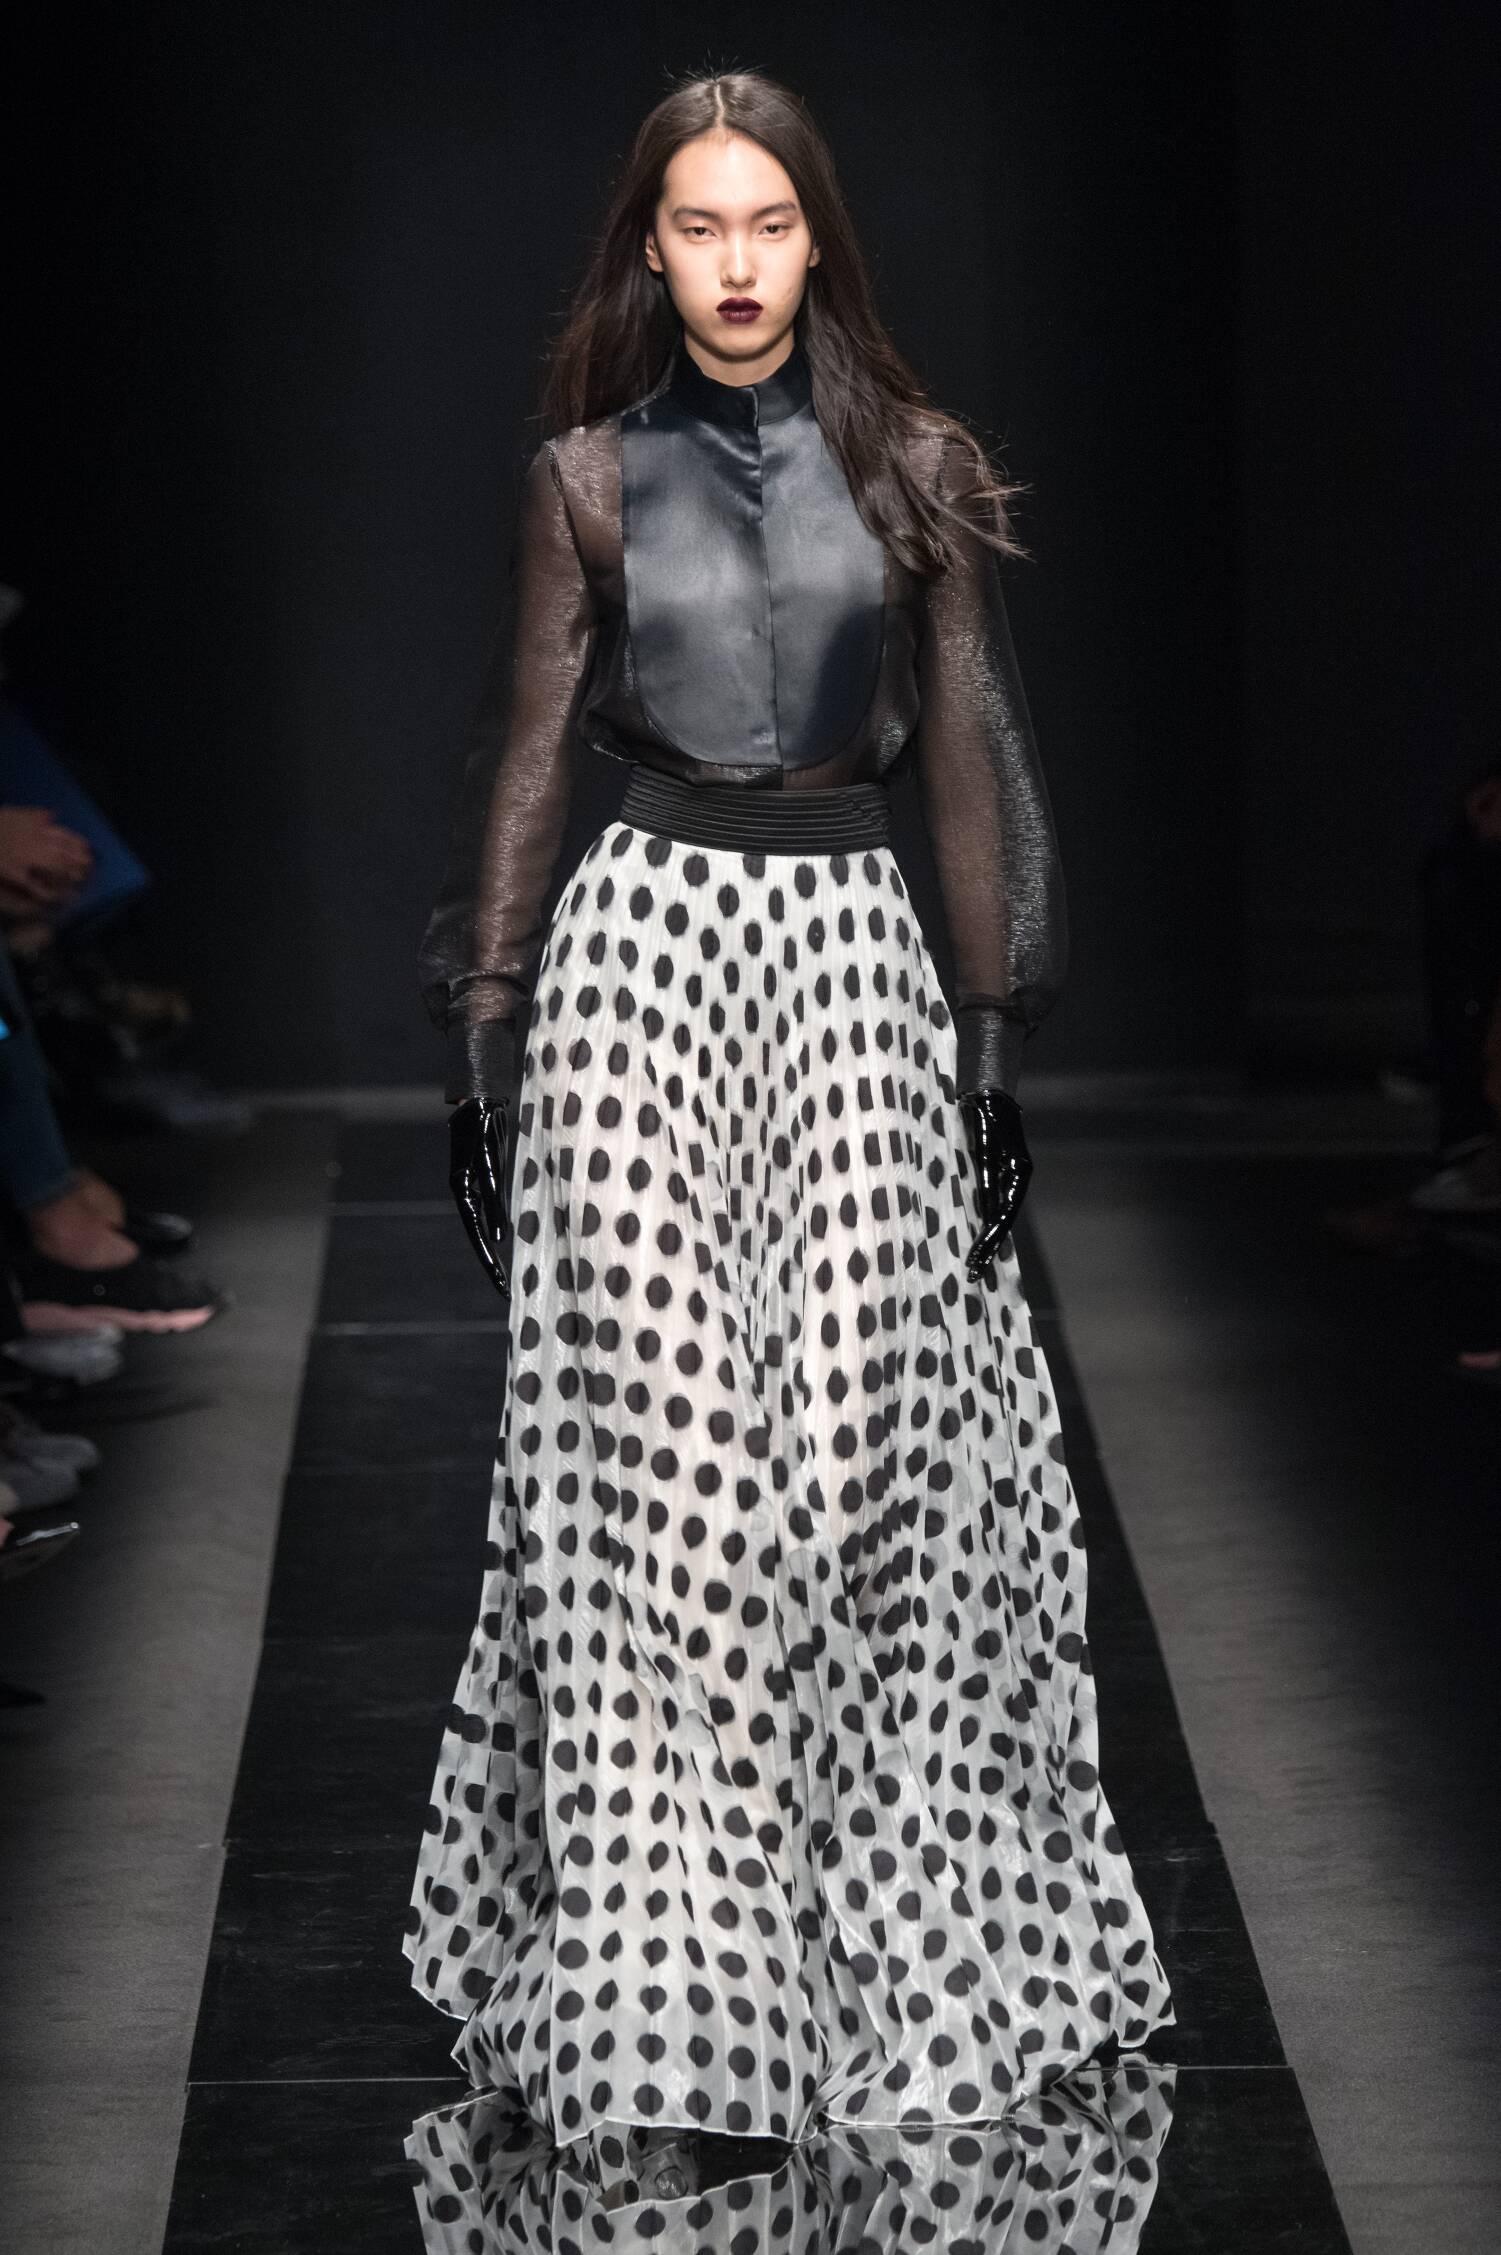 Winter 2015 Fashion Show Emanuel Ungaro Collection